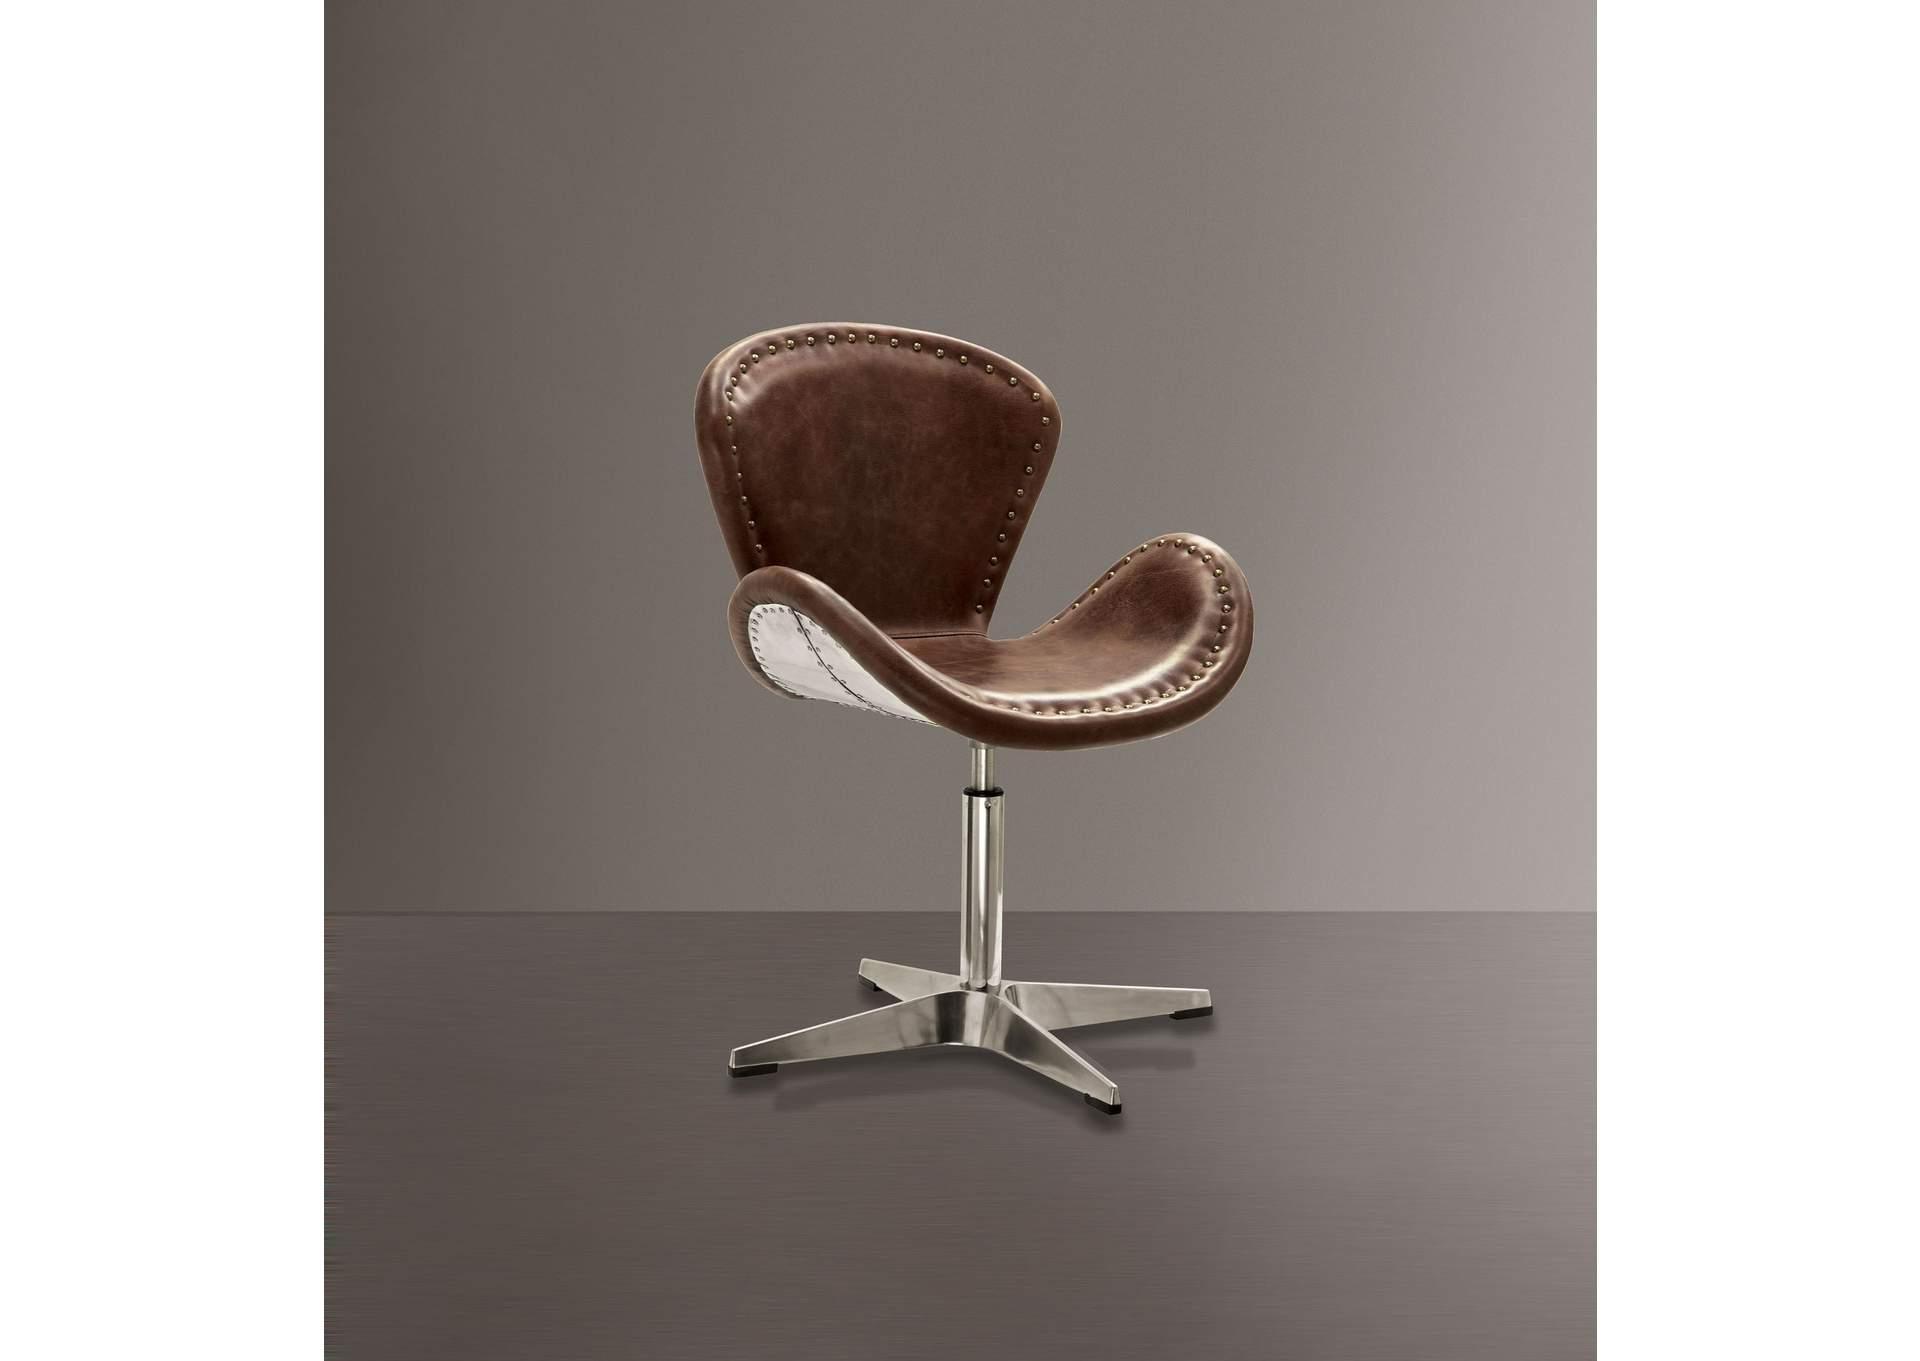 Brancaster Retro Brown TGL U0026 Aluminum Accent Chair W/Swivel (1Pc),Acme